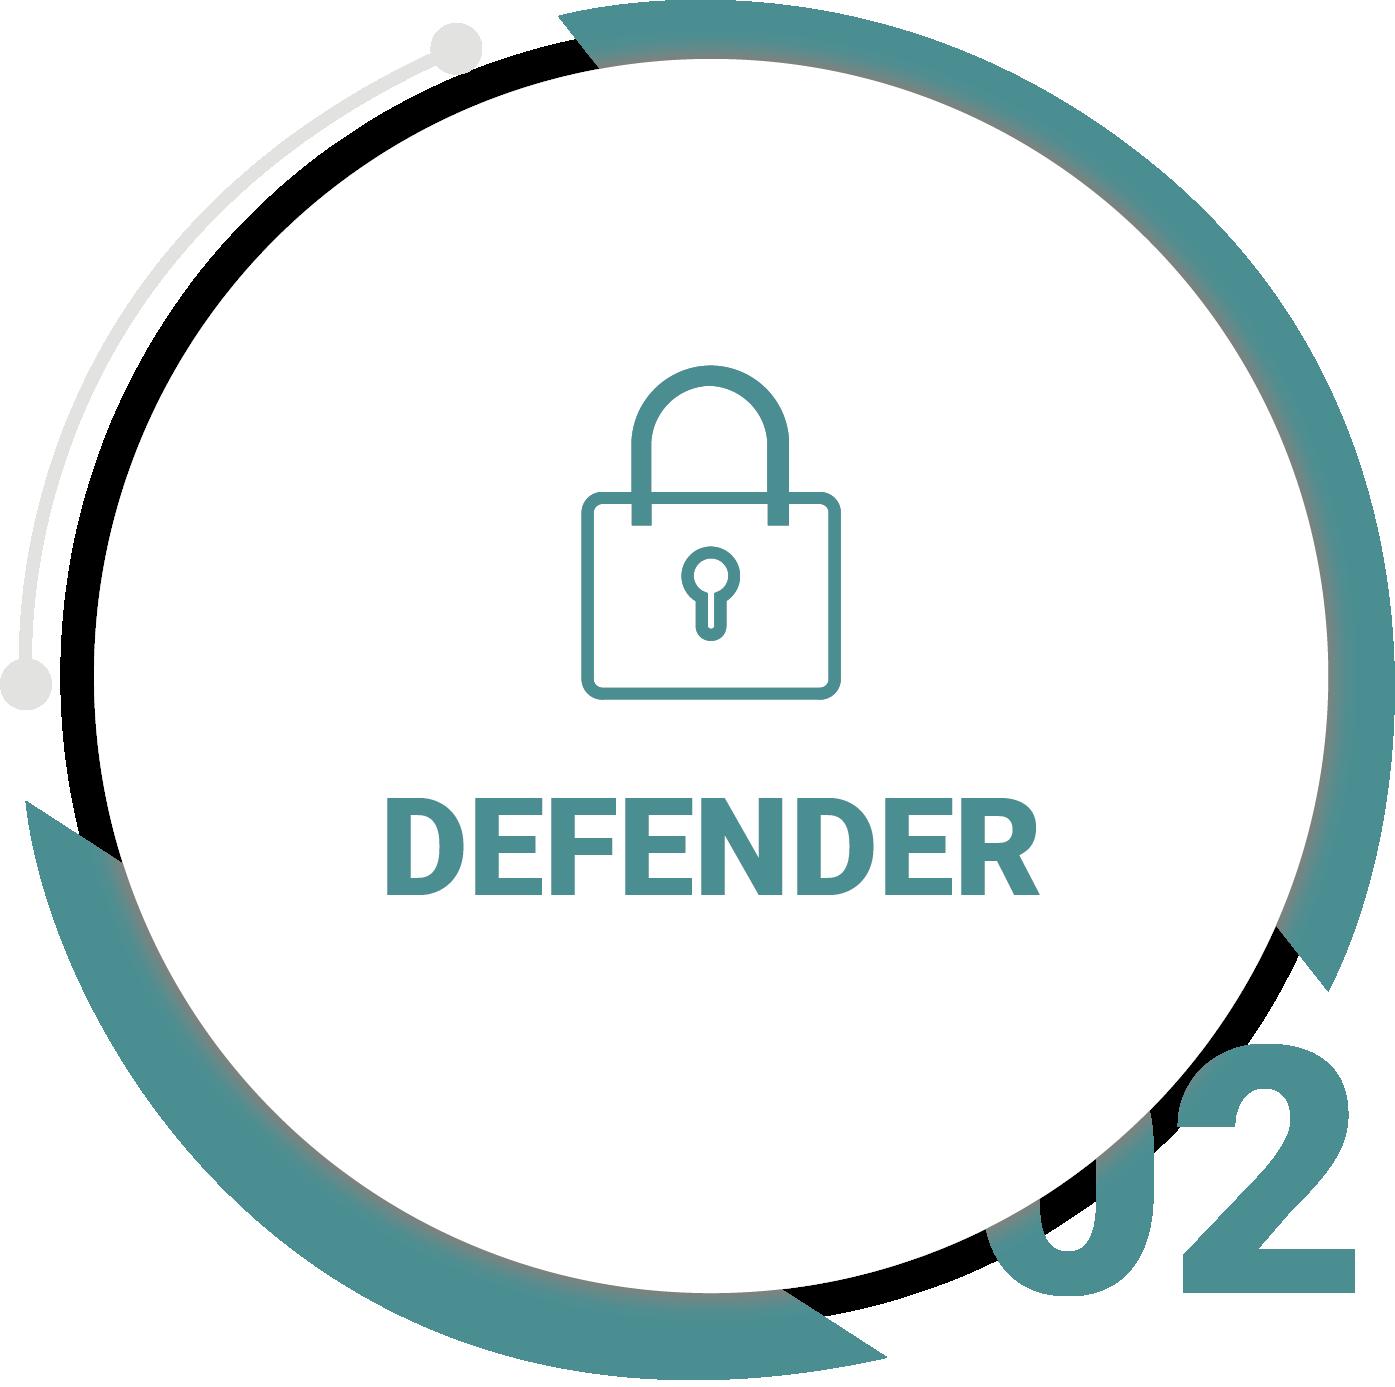 Defender - Ciberseguridad Verne Group